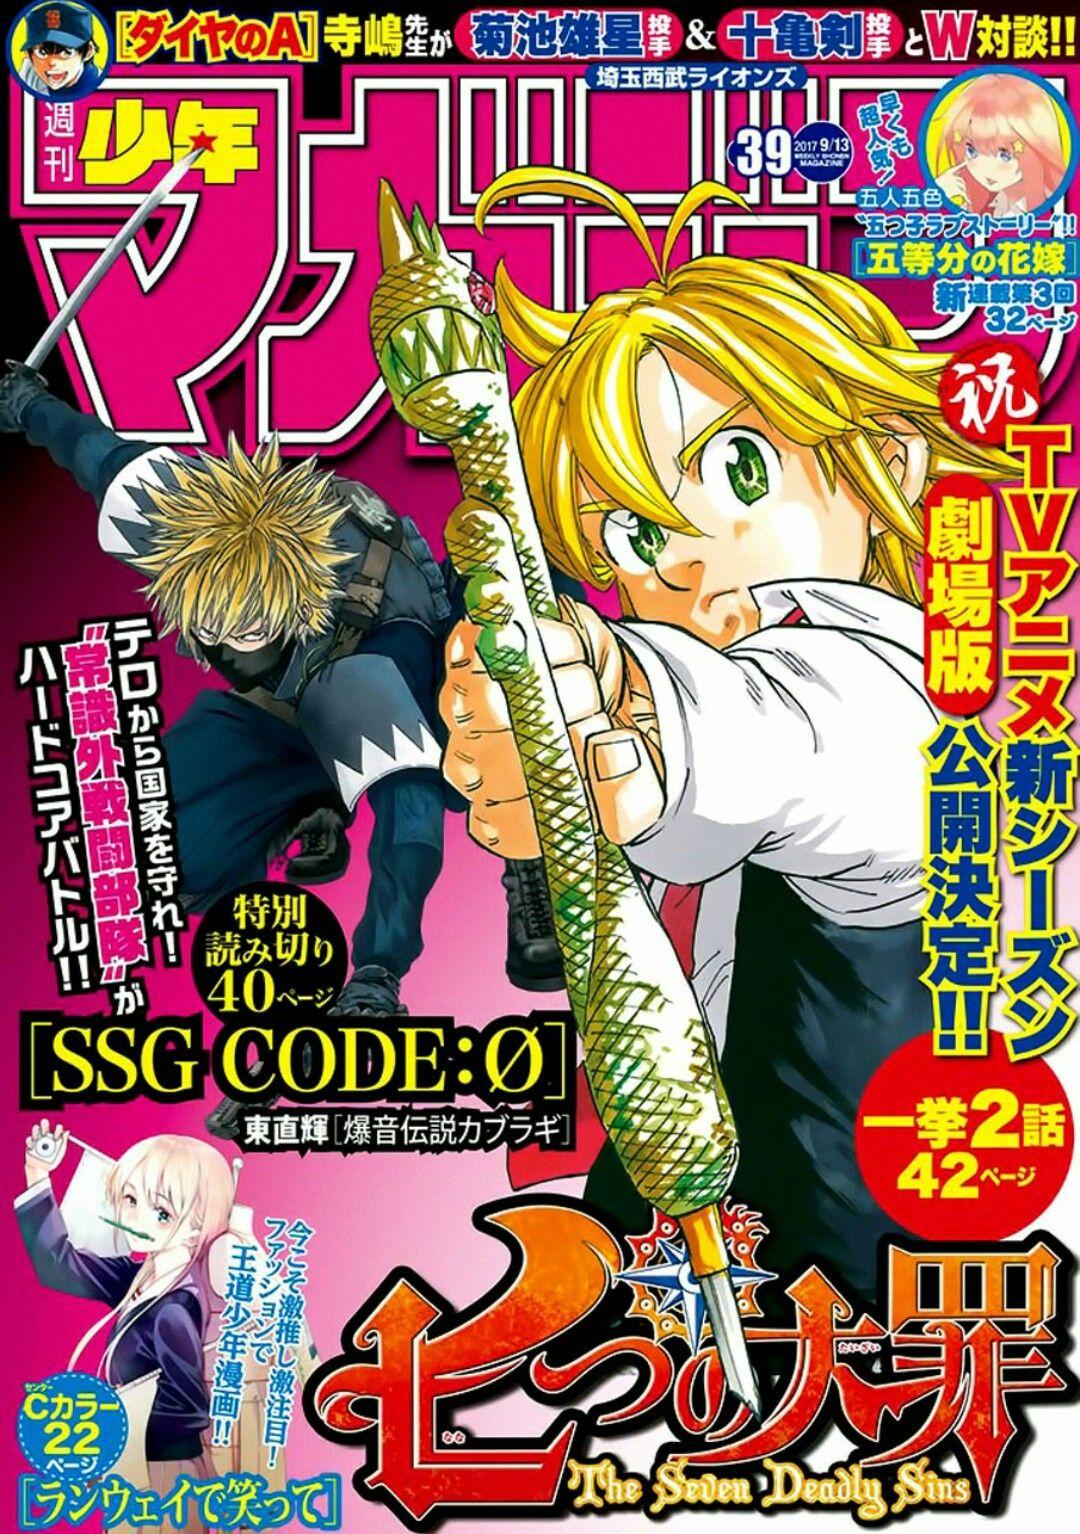 Nanatsu No Taizai Chapter 231 Page Color Raw Aesthetic Anime Japanese Poster Design Japanese Poster